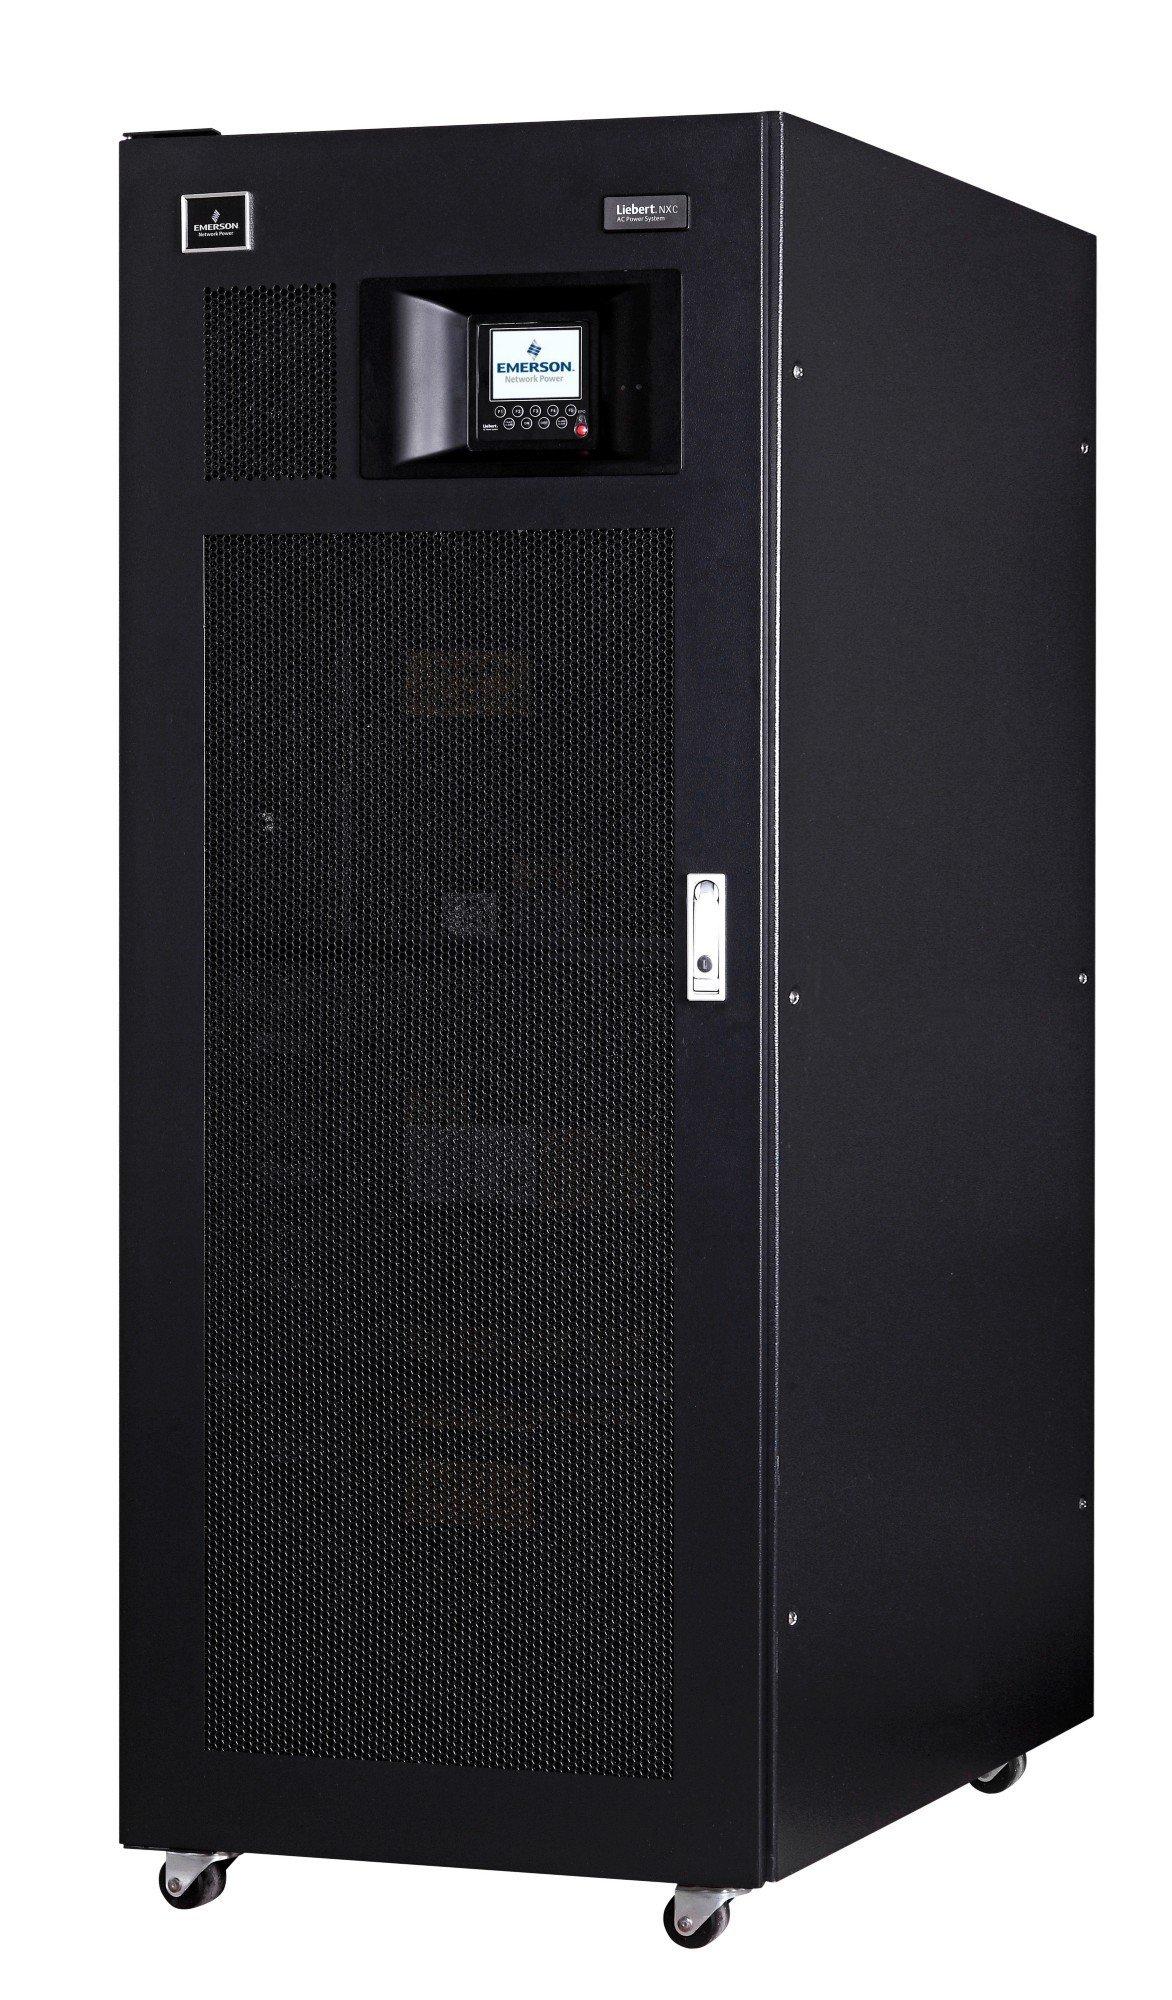 An image of Vertiv Liebert nxc 40kVA uninterruptible power supply (ups) 40000 VA double-conv...